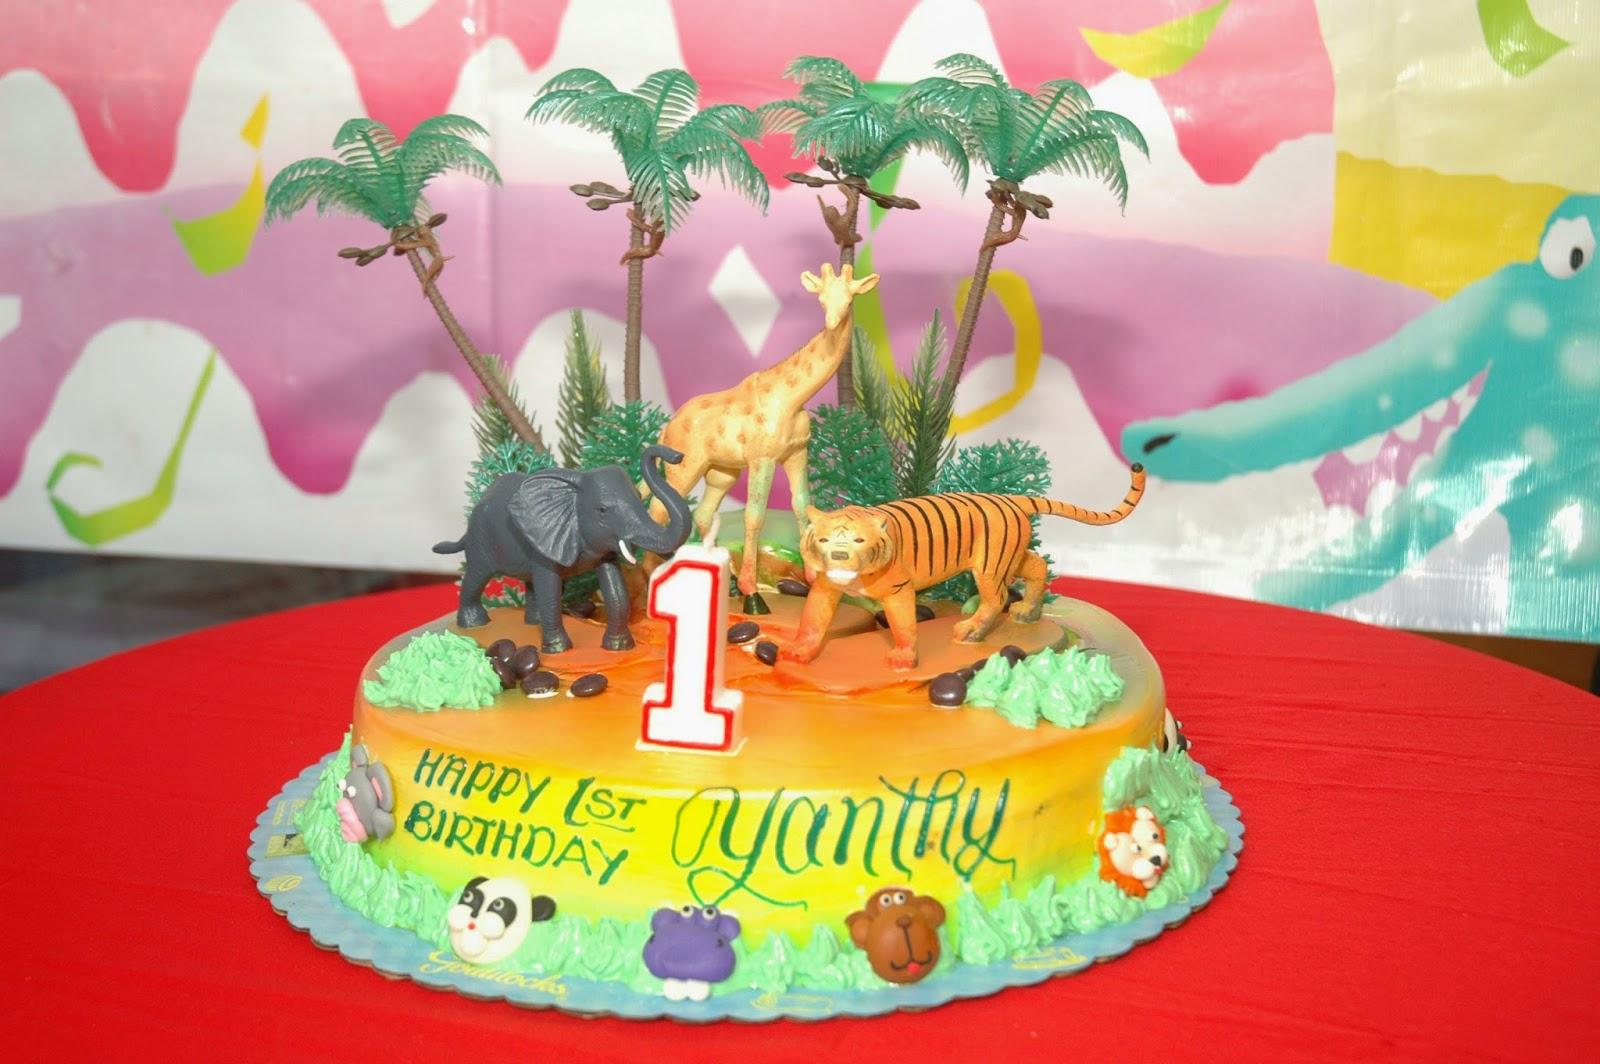 Super 6 Customized Cakes Goldilocks Photo Birthday Cake From Funny Birthday Cards Online Alyptdamsfinfo